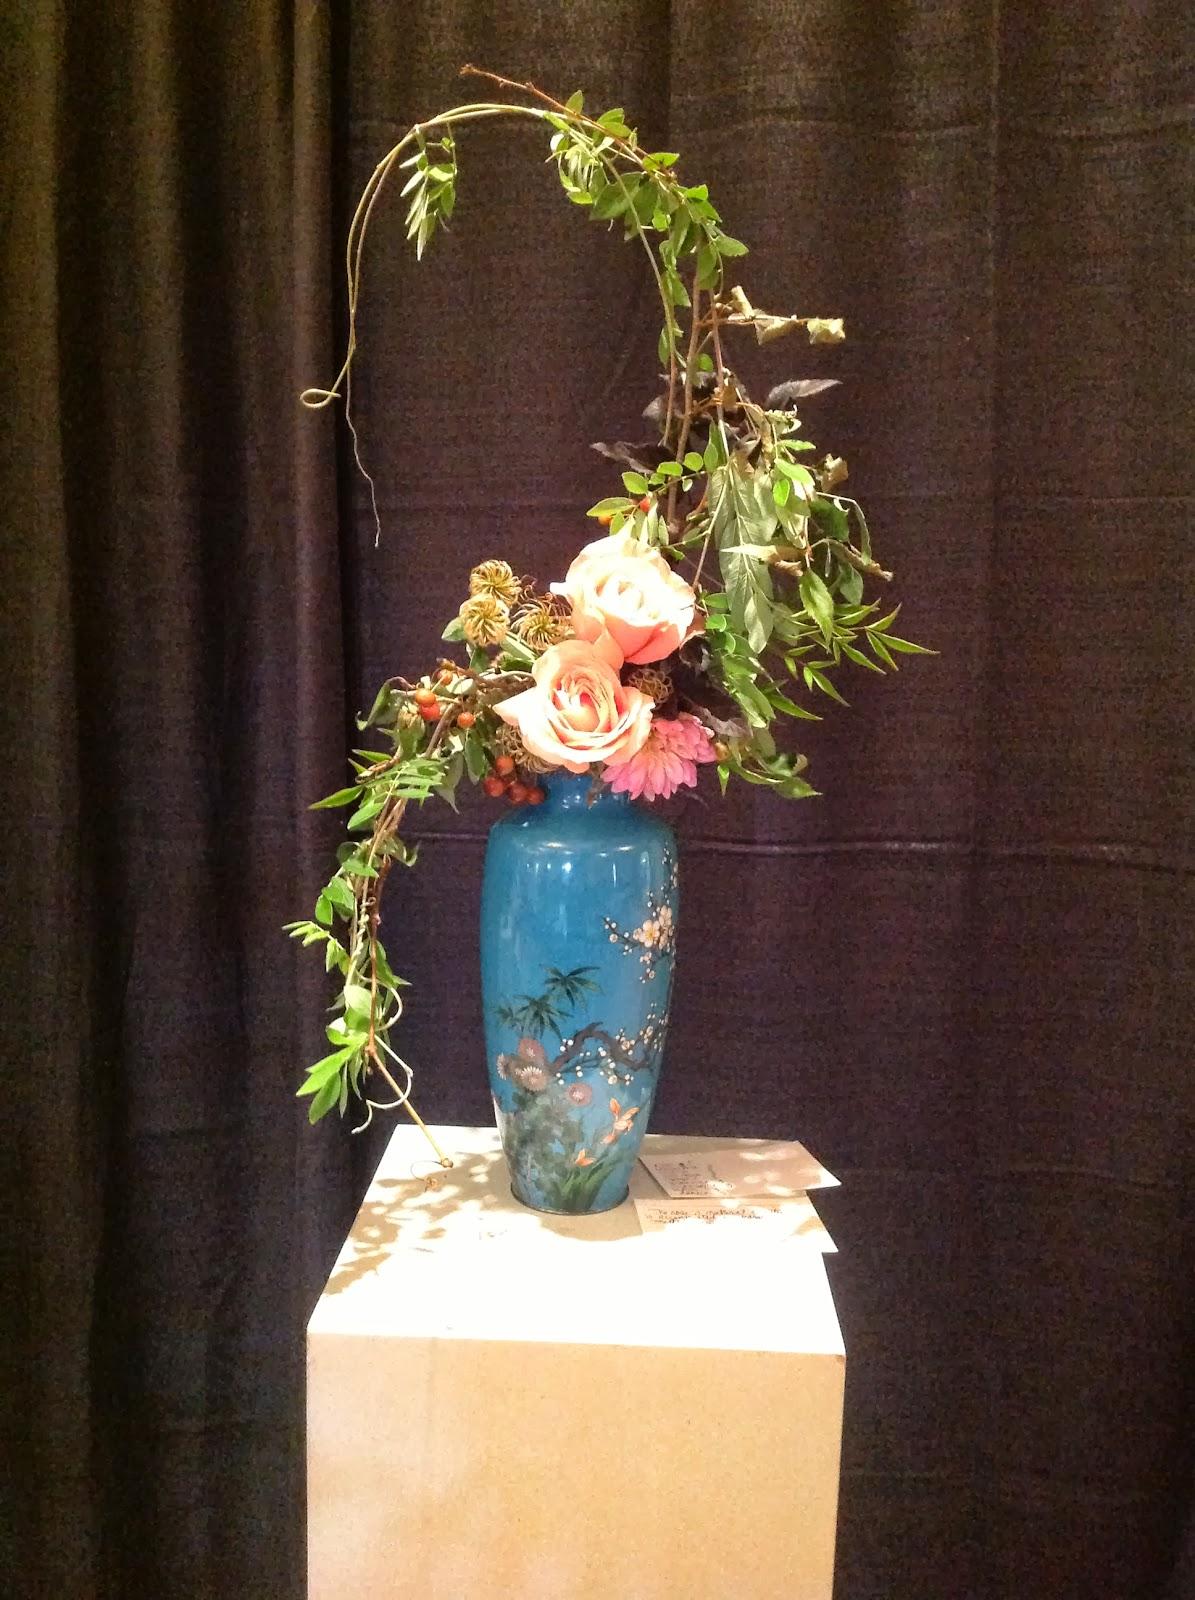 image Stretch Design Garden Club Of Va on capsule functional table design, creative line mass design, artistic floral design, monochromatic design, creative line floral design,